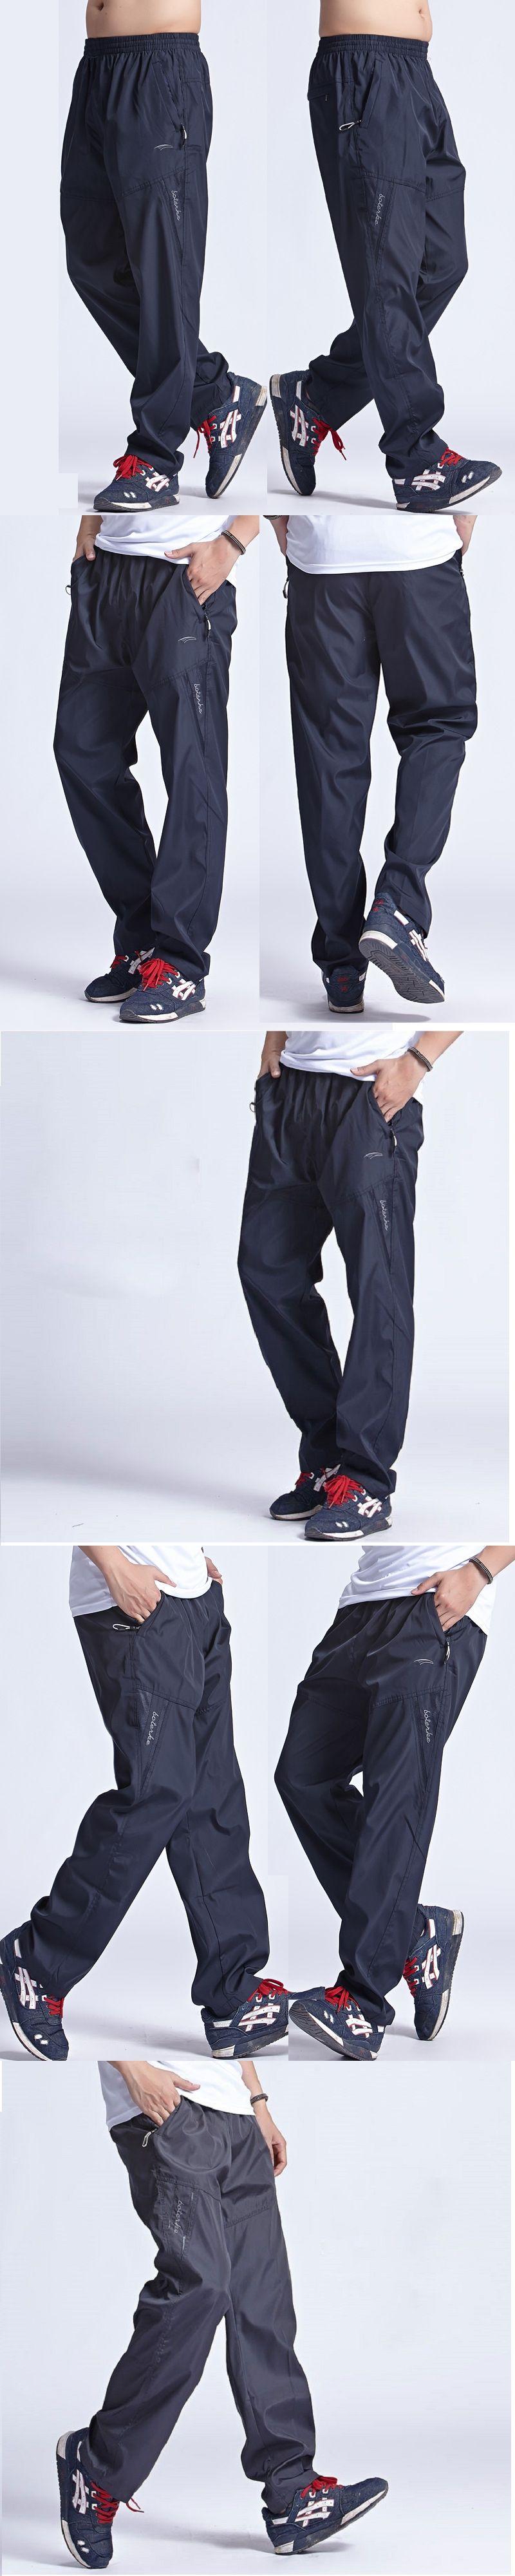 d42210d529c Grandwish 2017 New Quickly Dry Breathable Exercise Pants Men Elastic Waist  Men Active Pants Outside Trousers